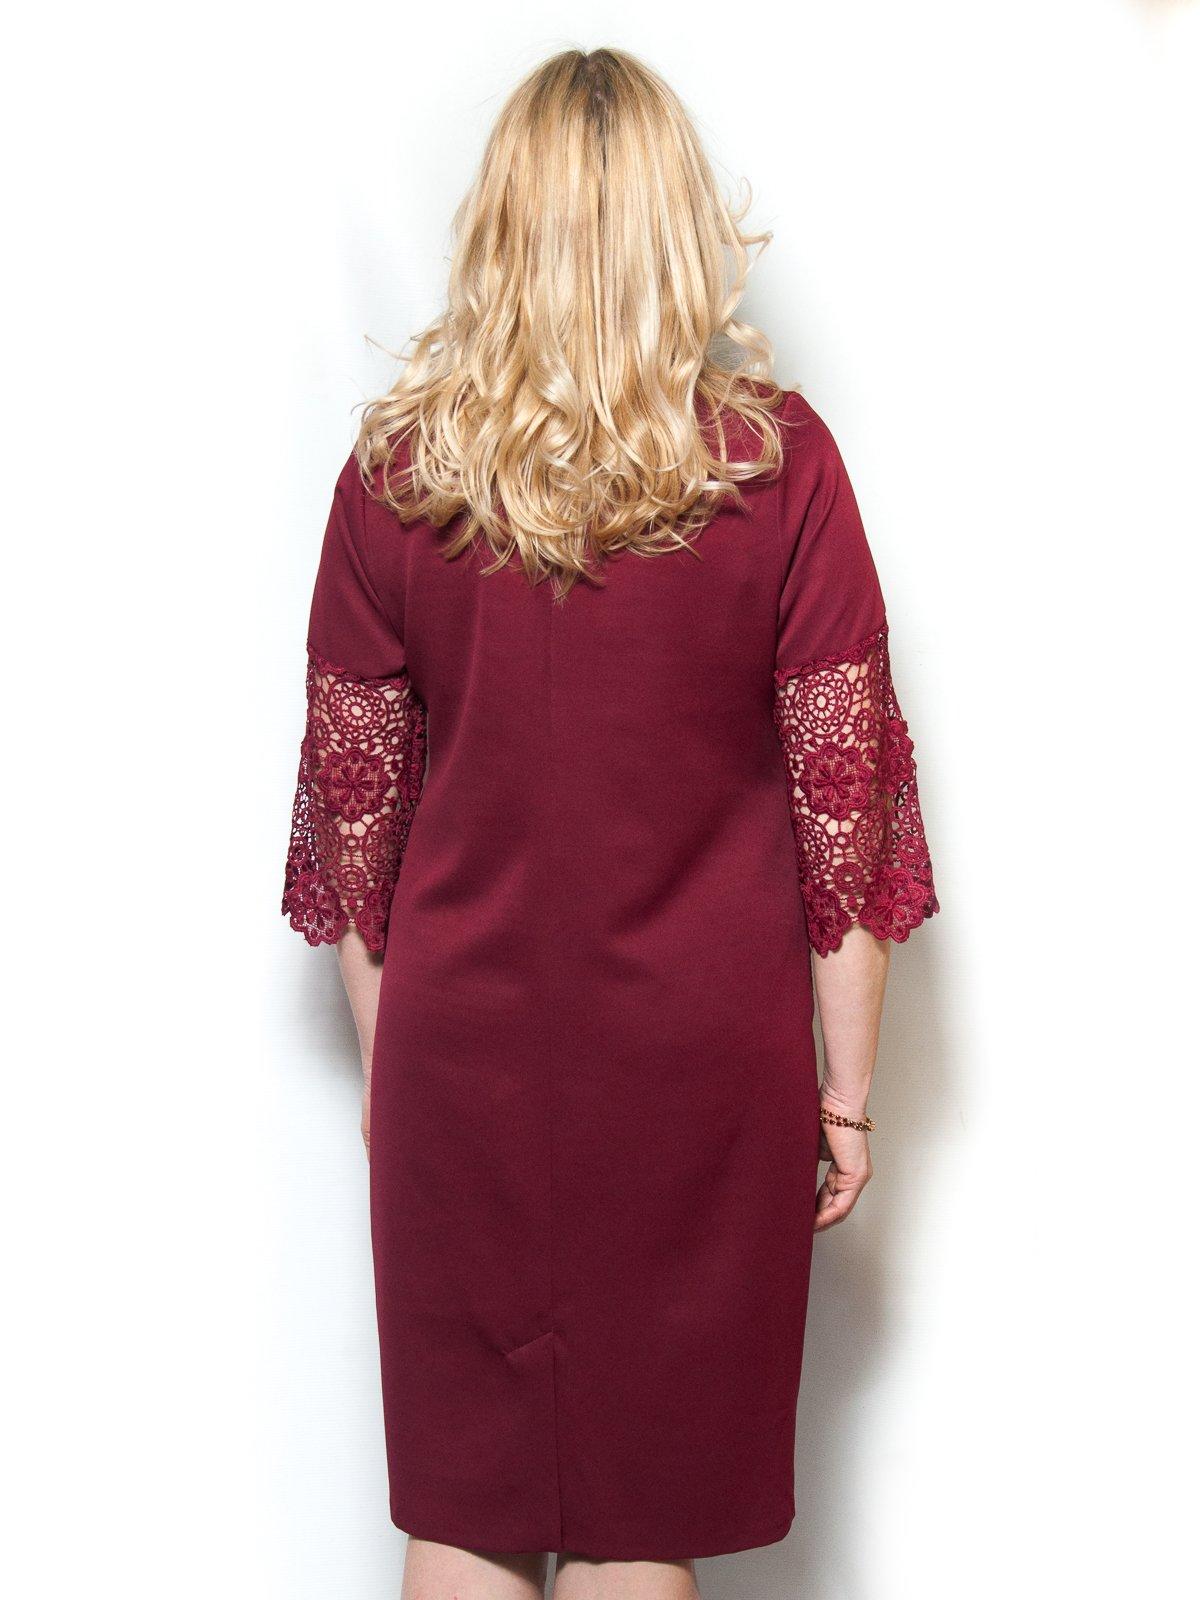 Сукня бордова | 4071397 | фото 2